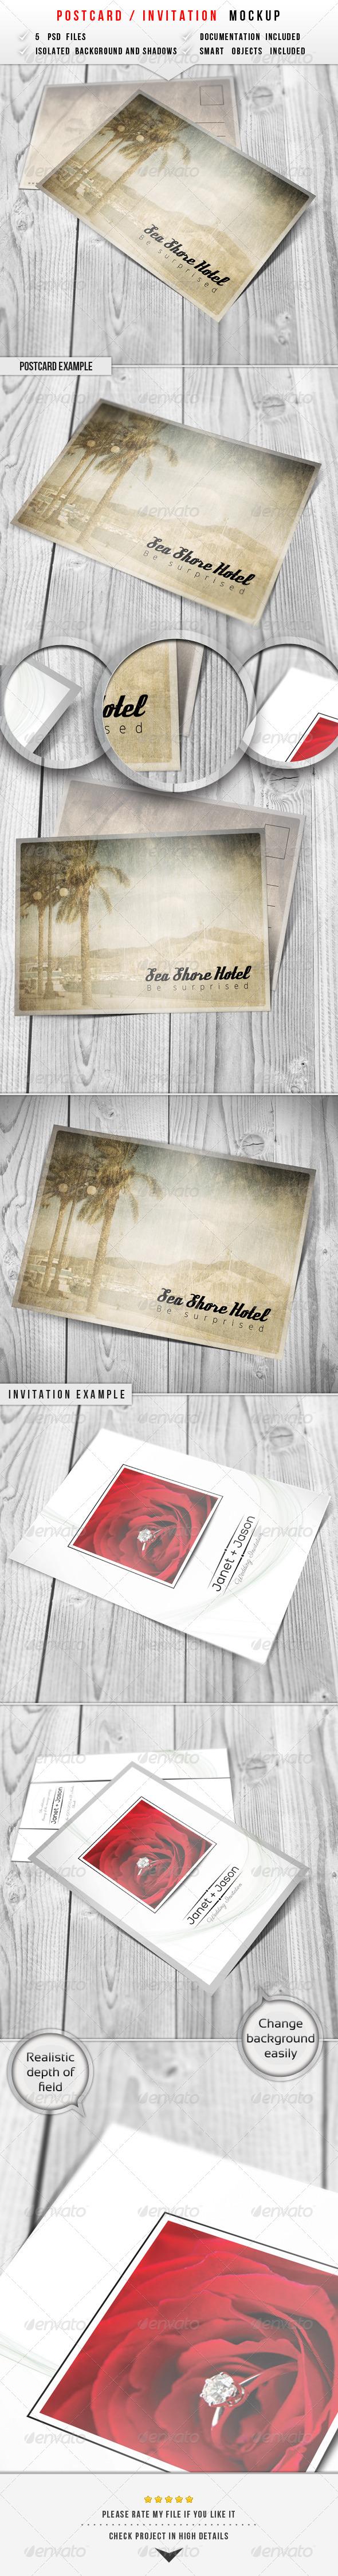 GraphicRiver Postcard & Invitation Mockup 6249130